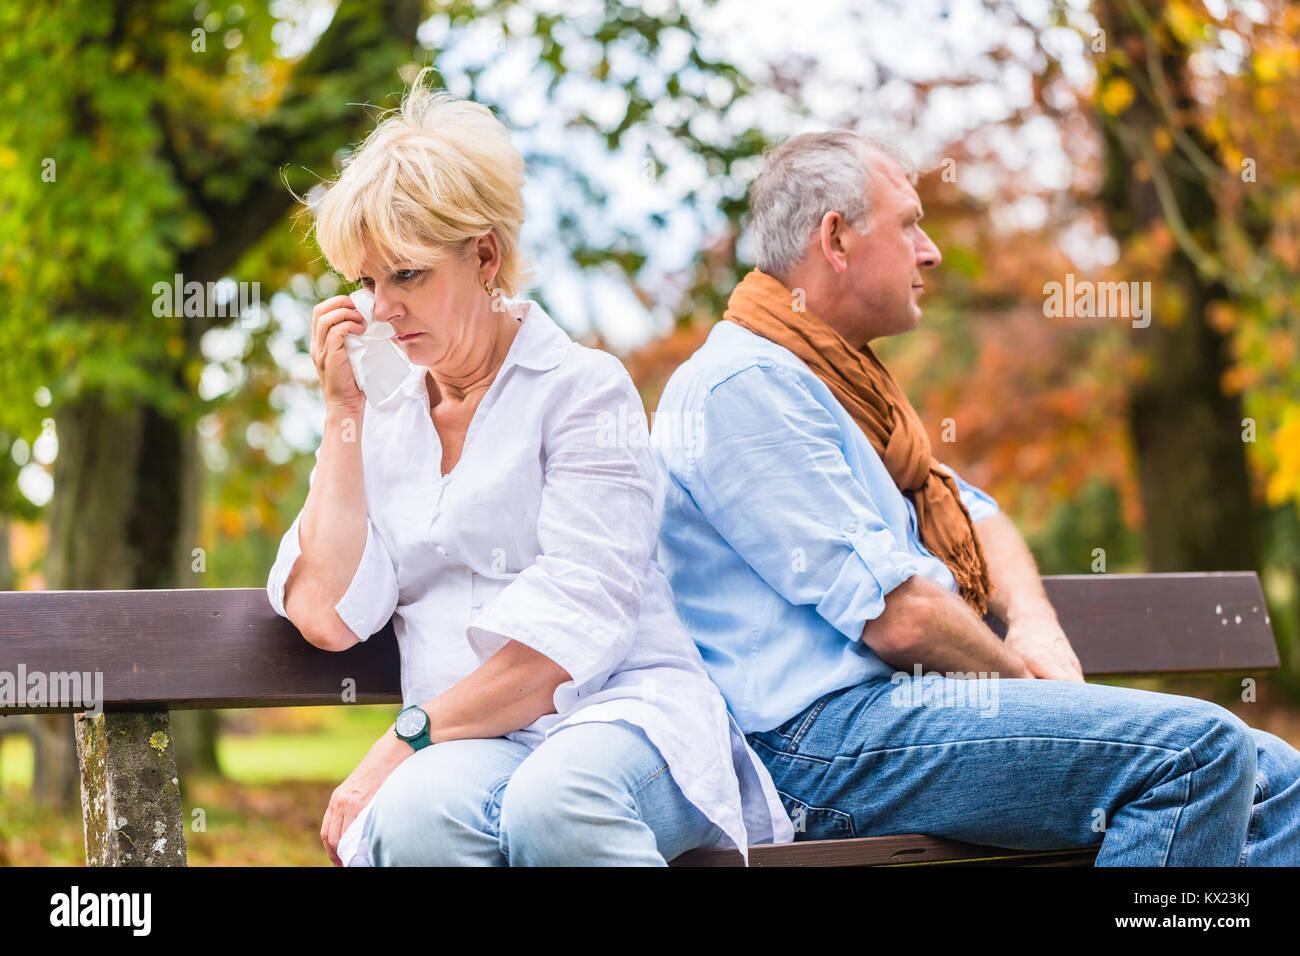 Senior man and woman having argument - Stock Image